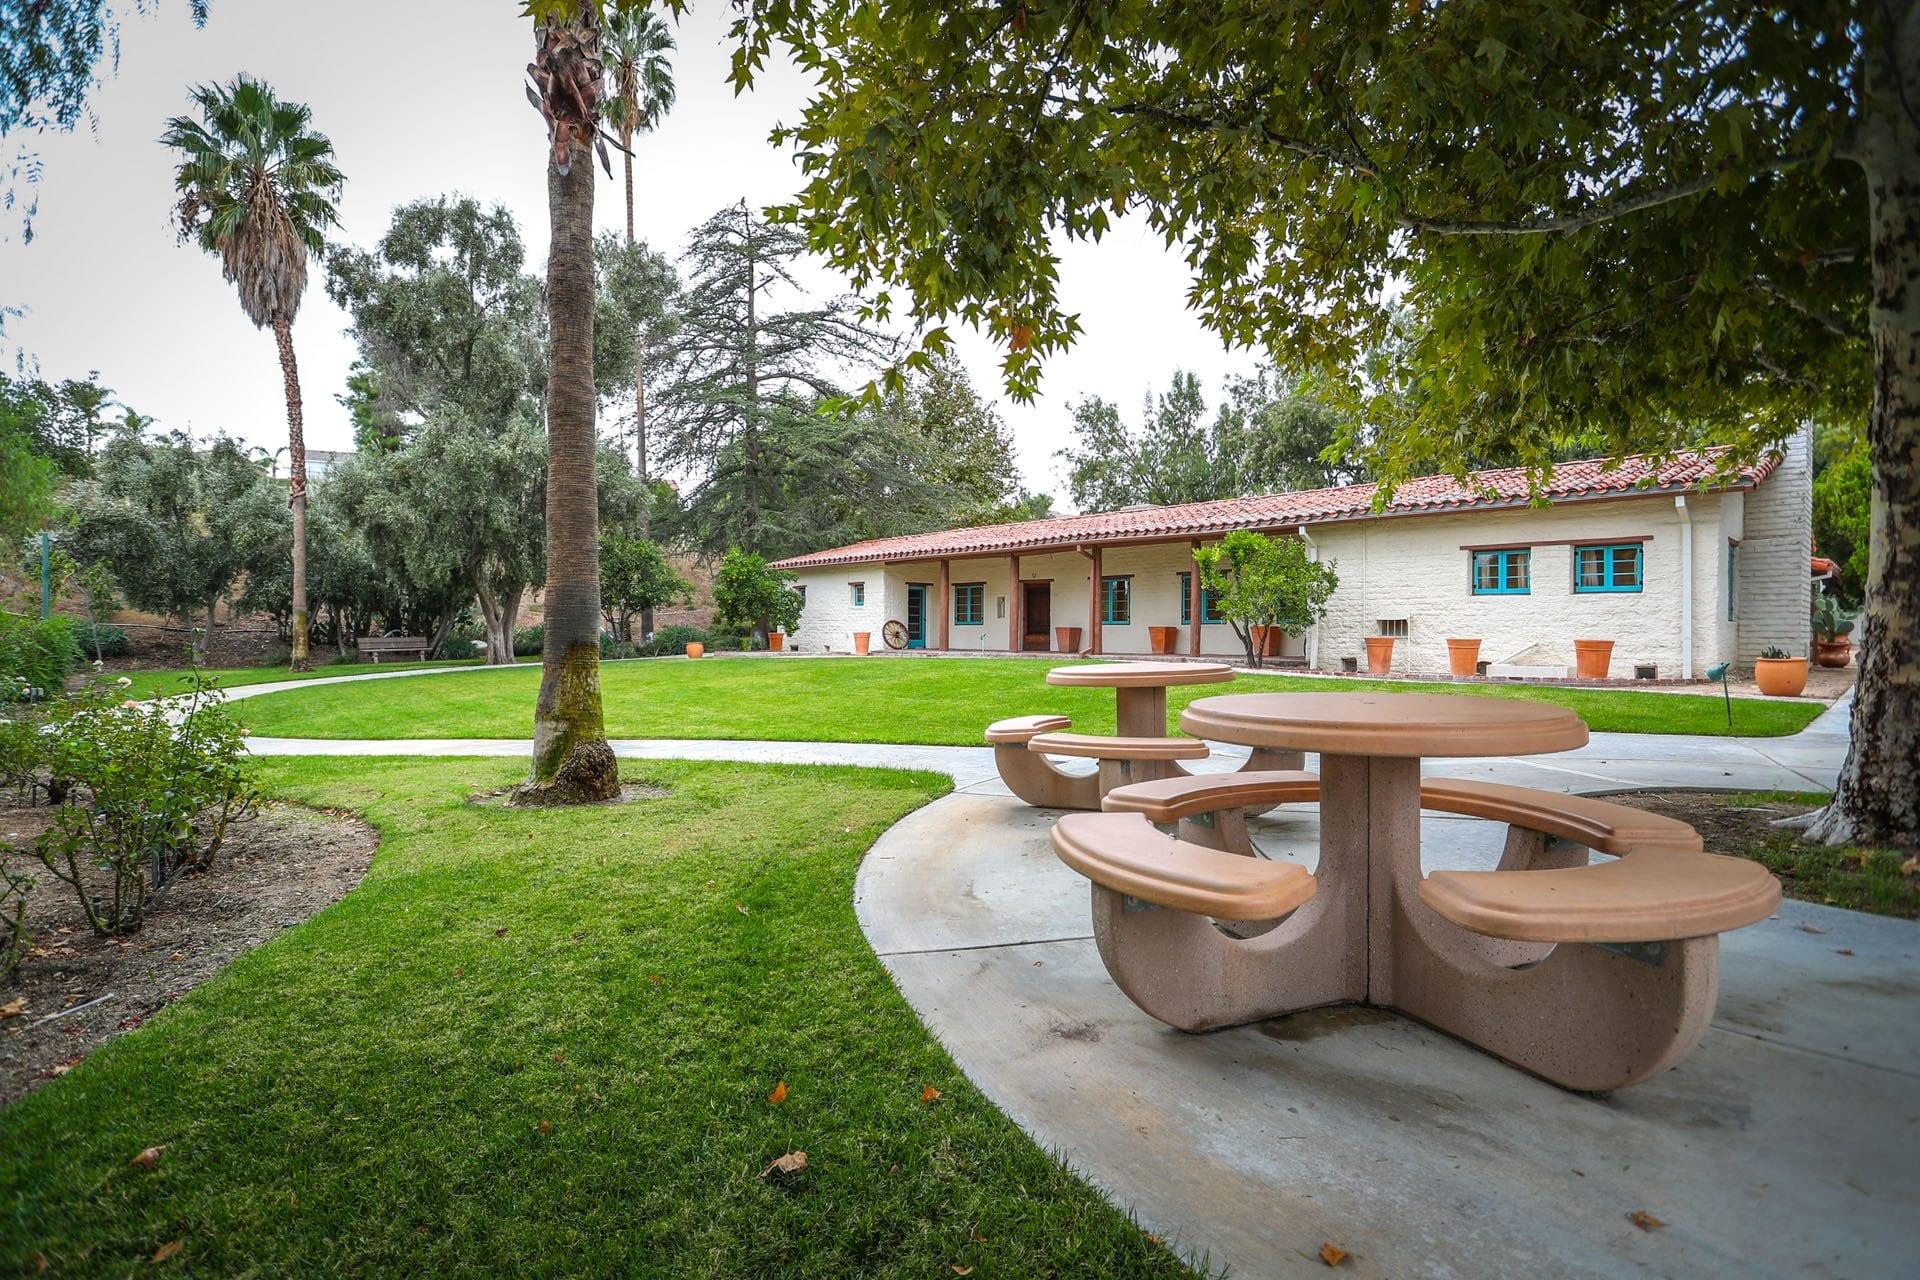 Tesoro Adobe Historic Park Parks Recreation